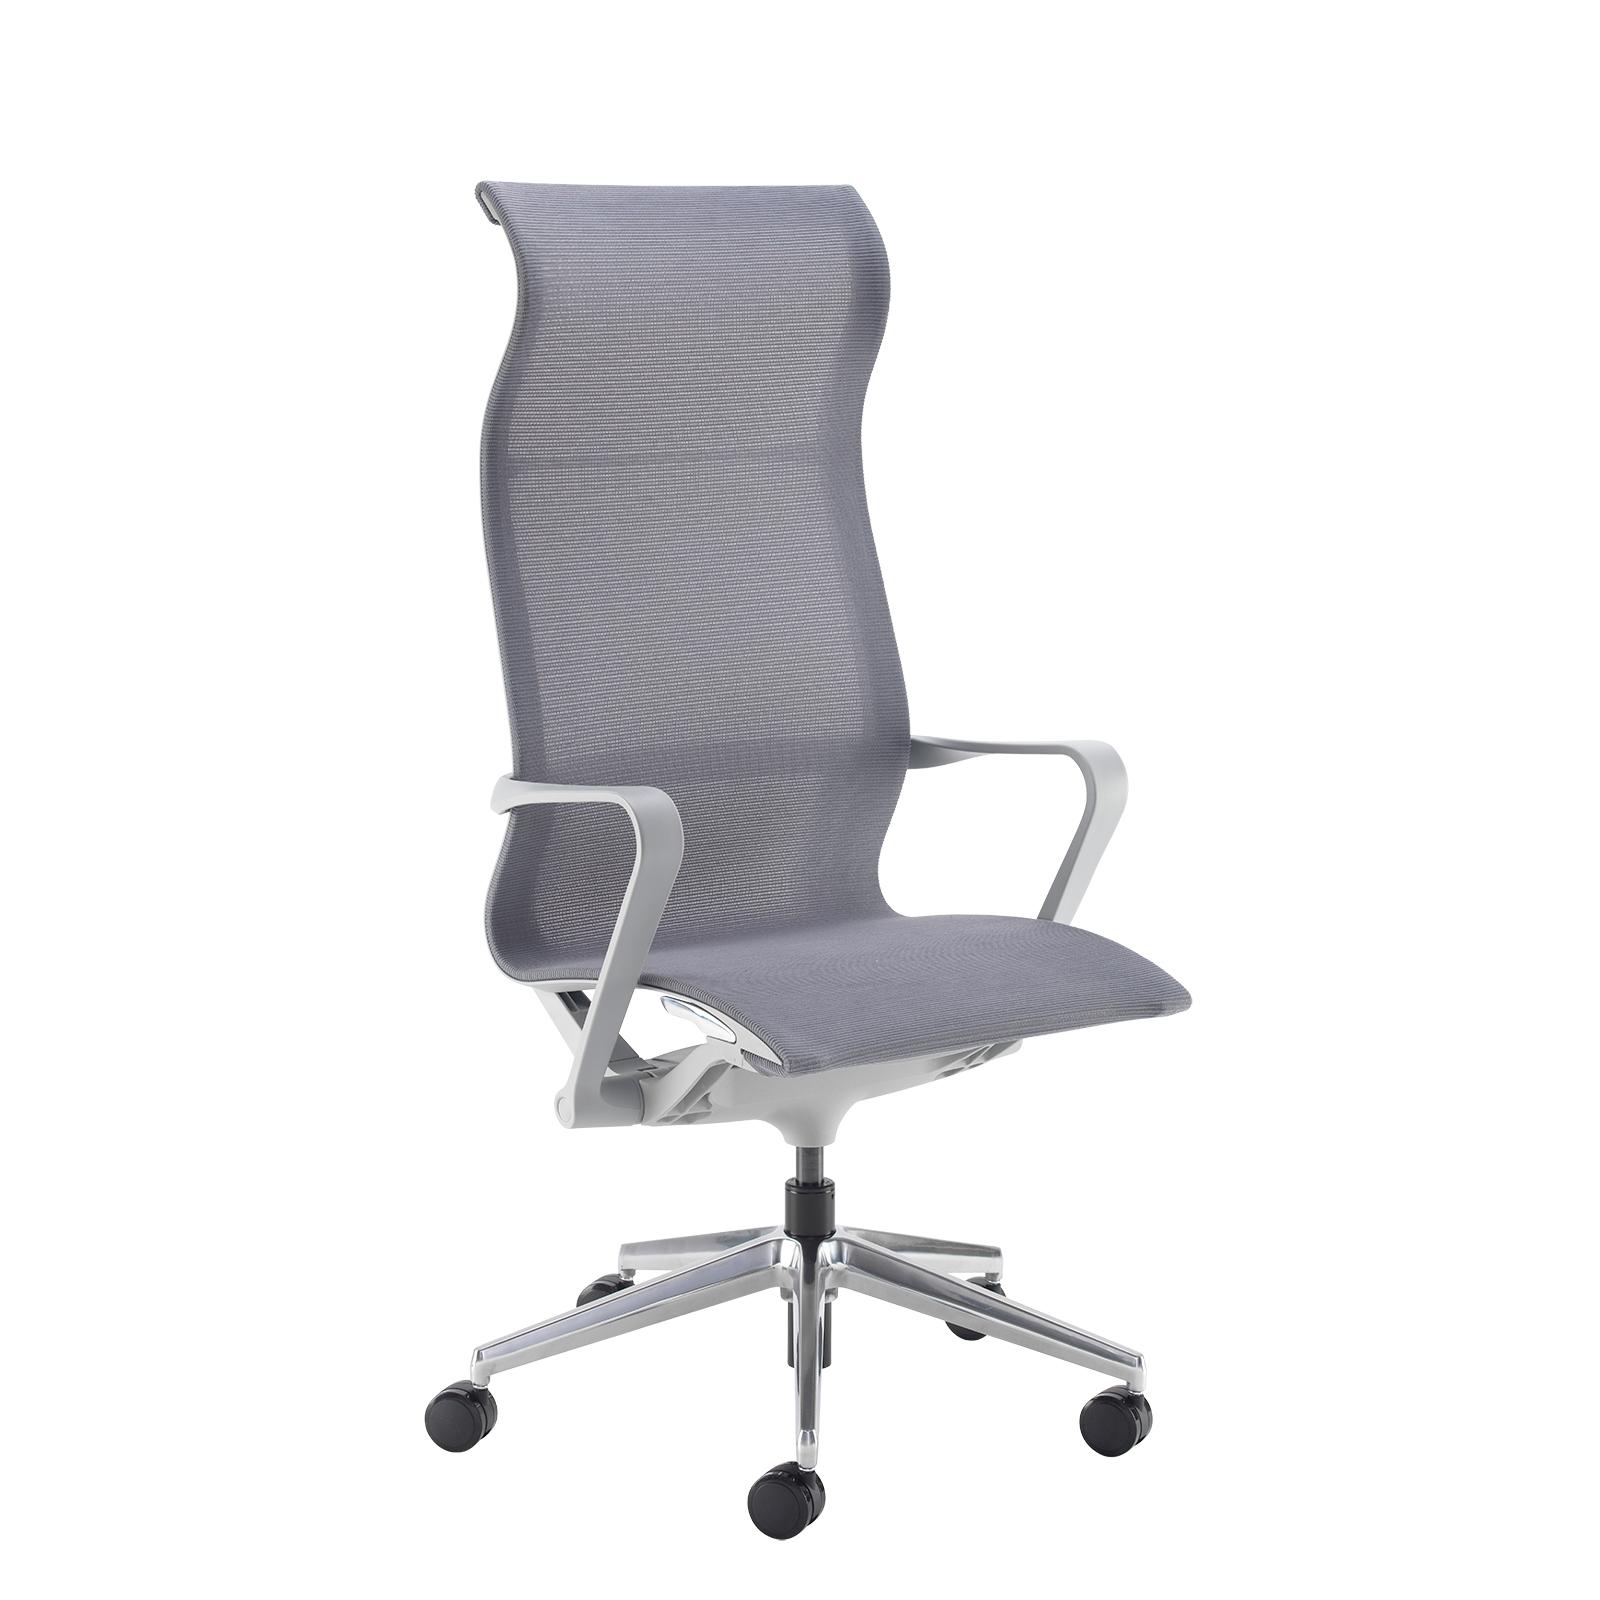 Lola high back designer operators chair